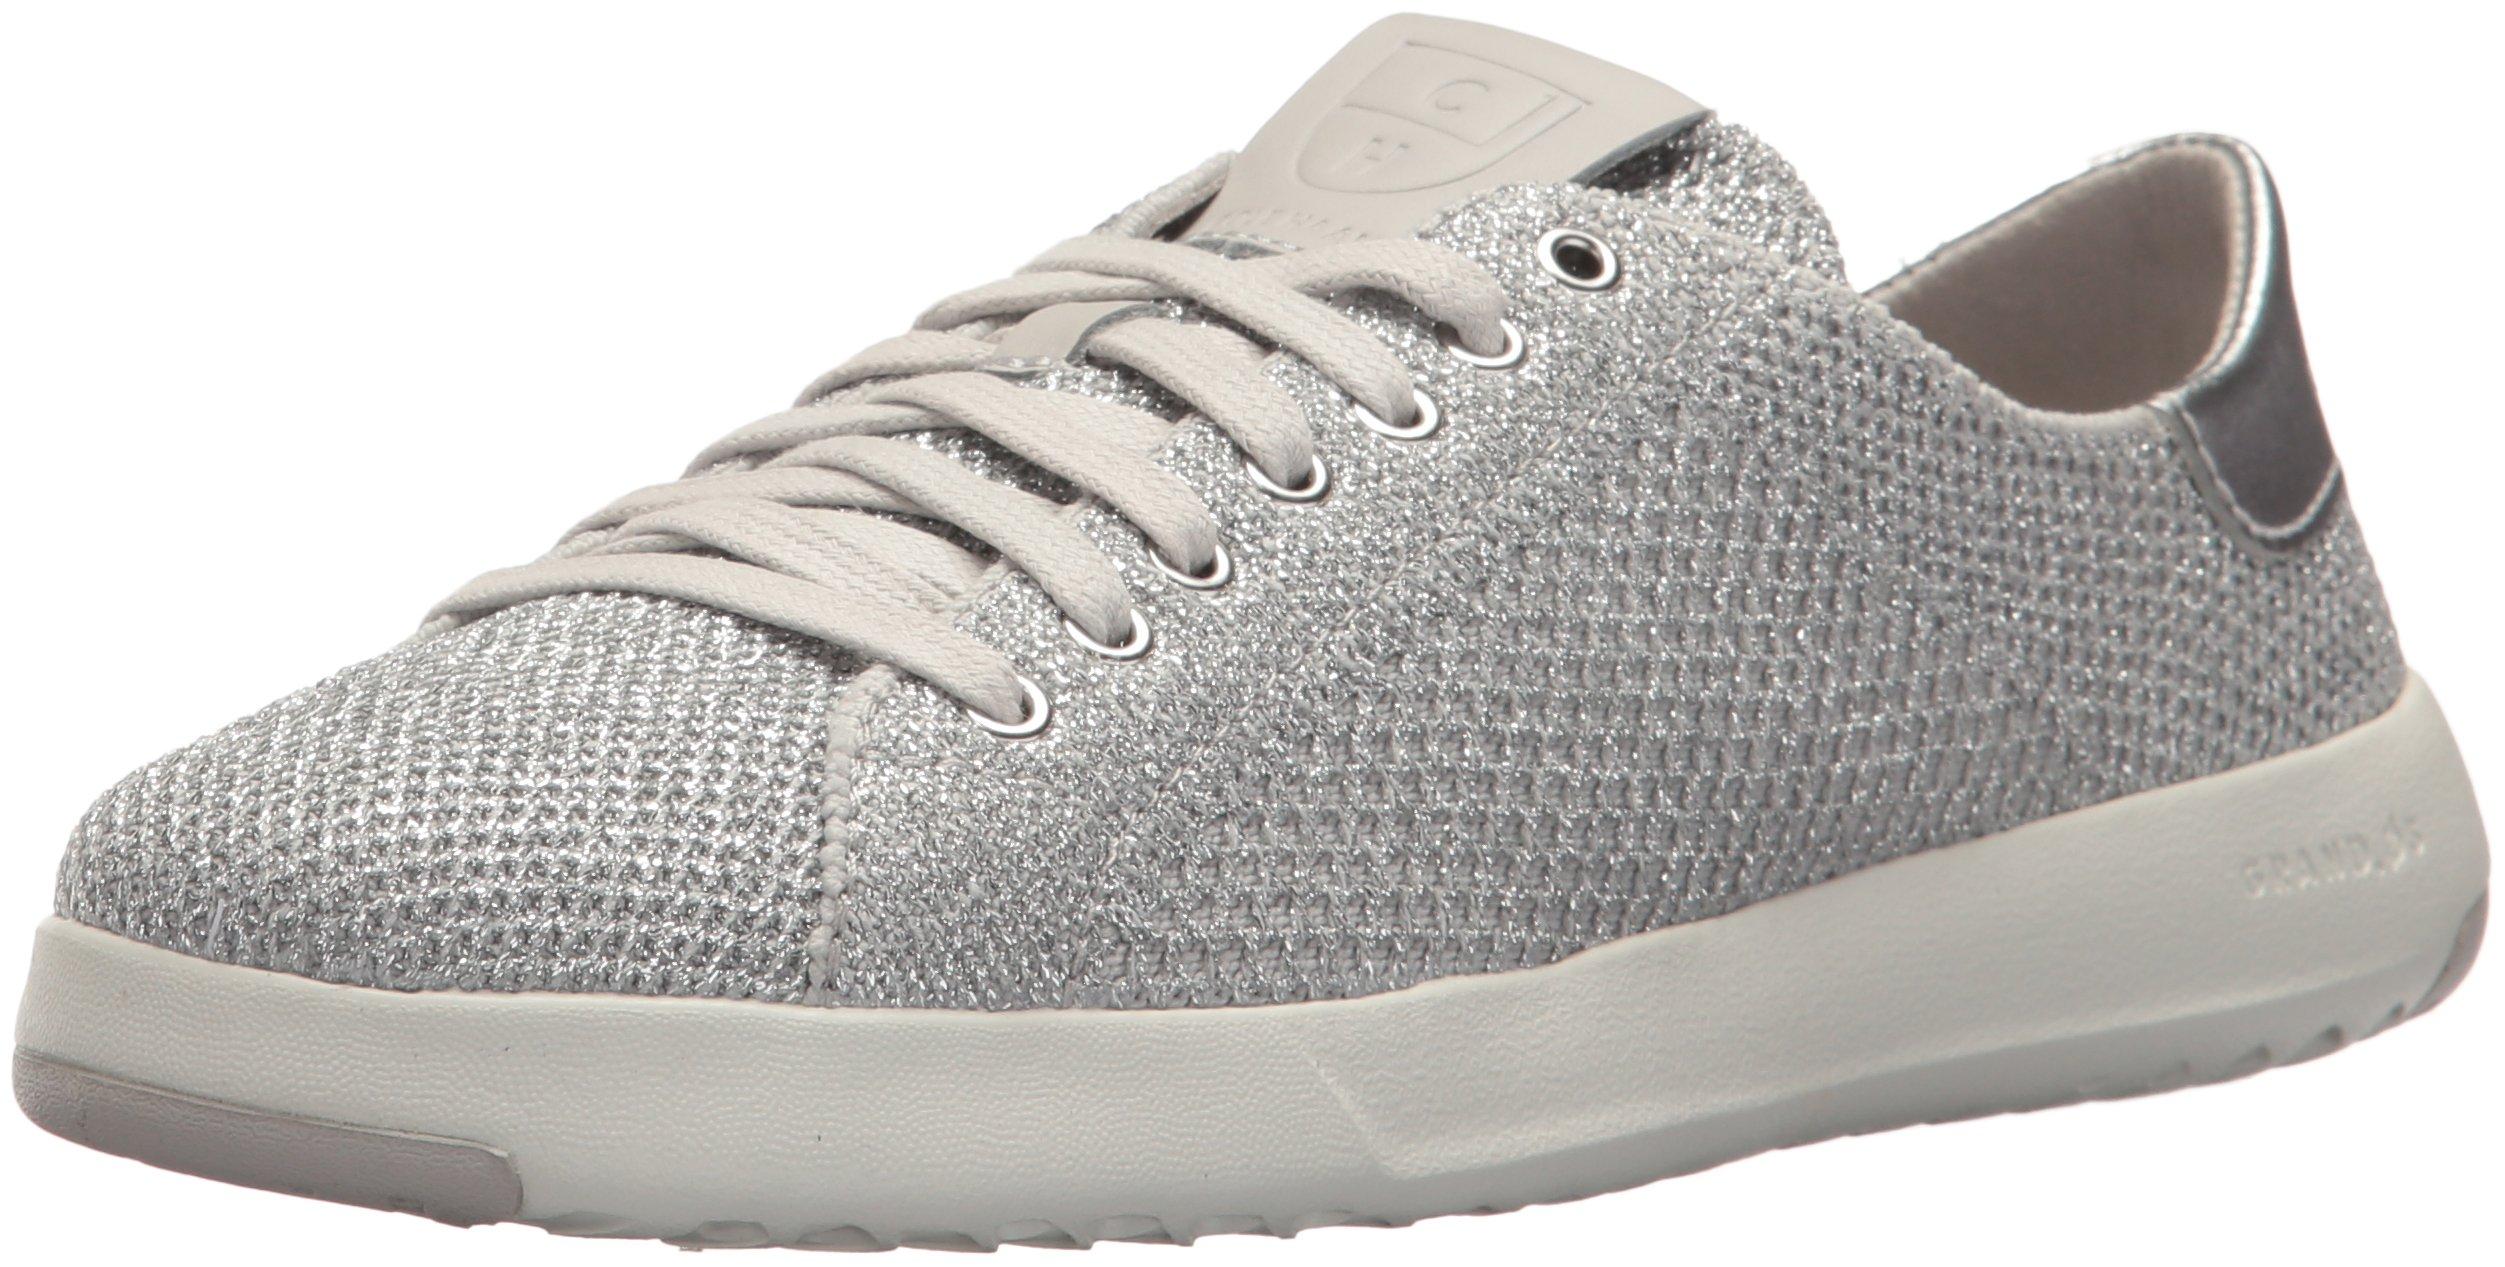 Cole Haan Women's Grandpro Tennis Stitchlite Sneaker, Metallic/Silver, 6 B US